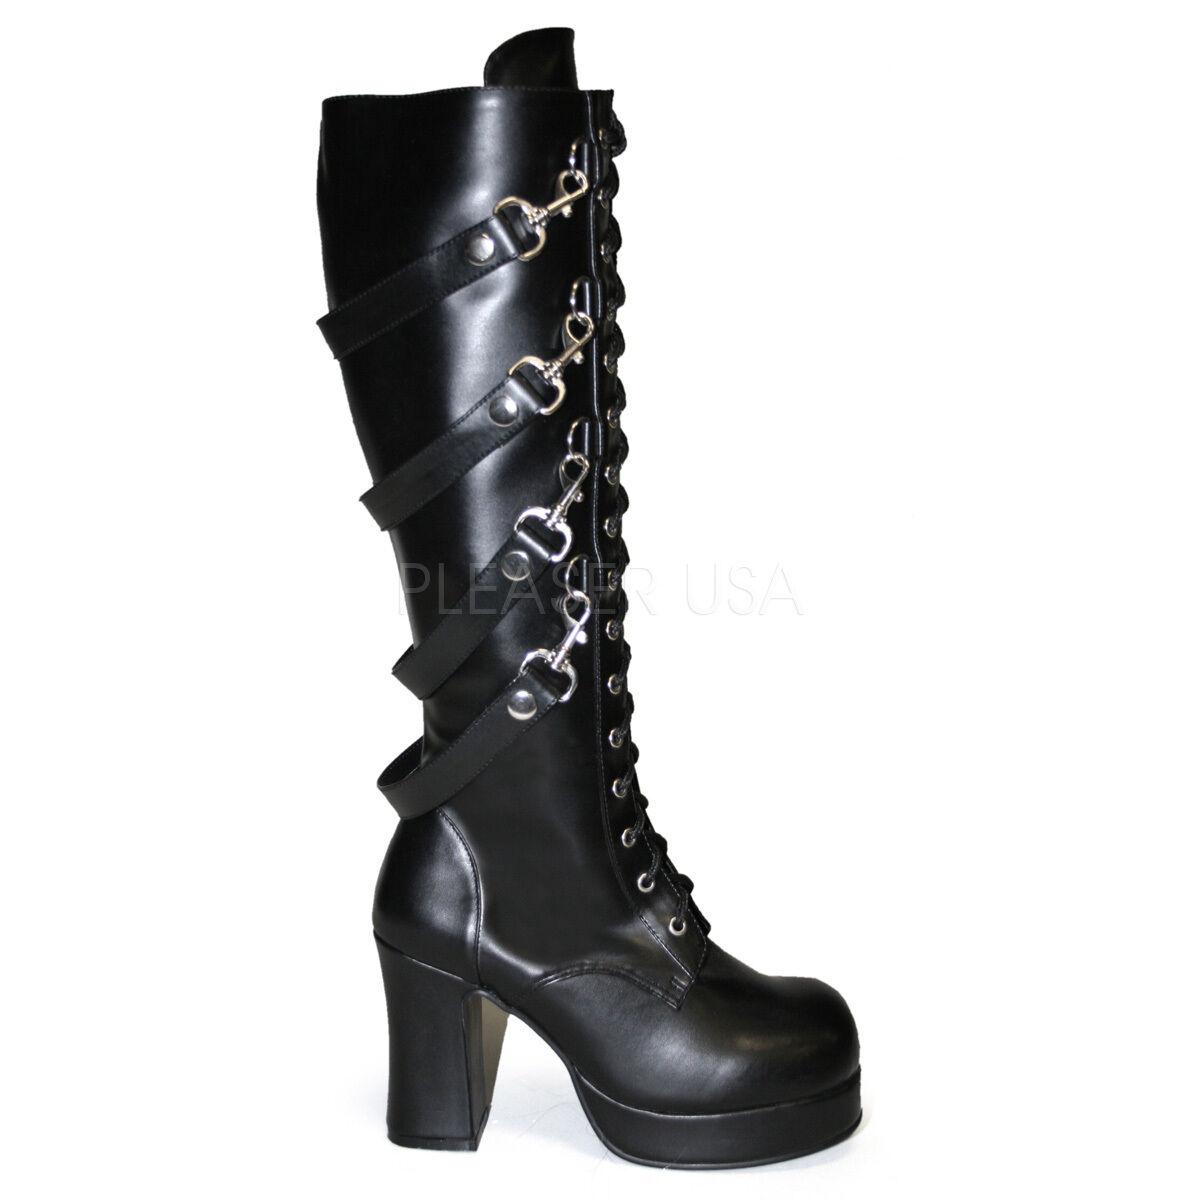 Demonia GOTHIKA INFERNO 209 Donna Nero Goth Punk Lolita Blocco INFERNO GOTHIKA 4 Catena Lacci e650fe